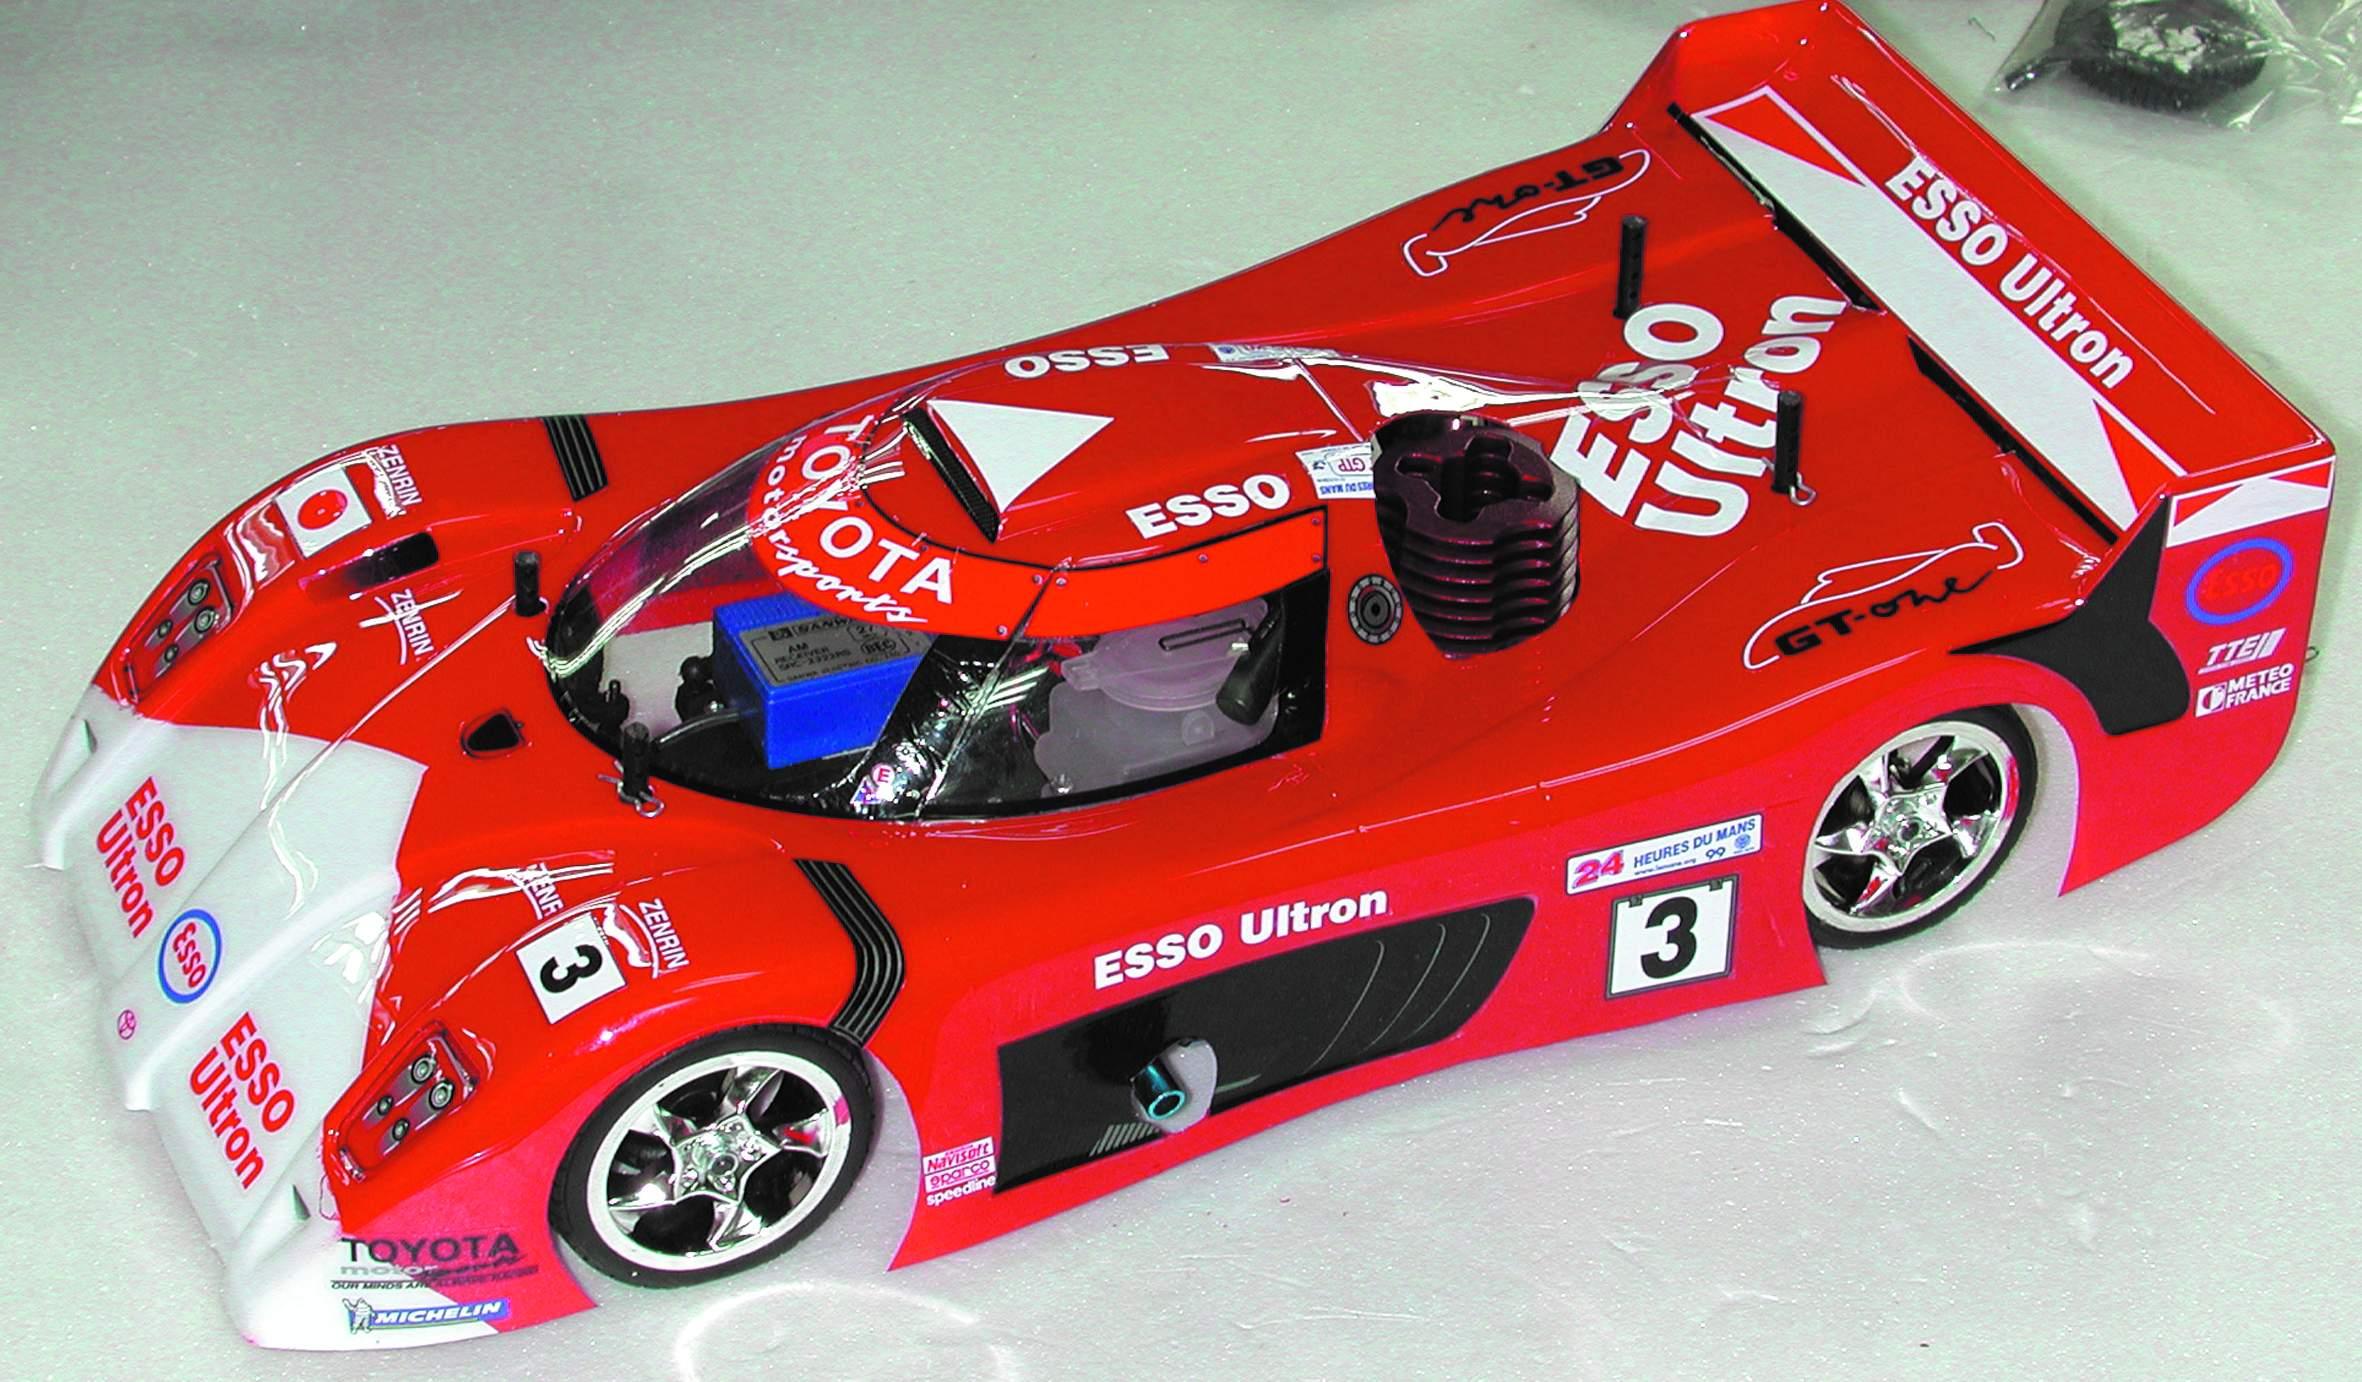 Ep Touring Rc Car Models